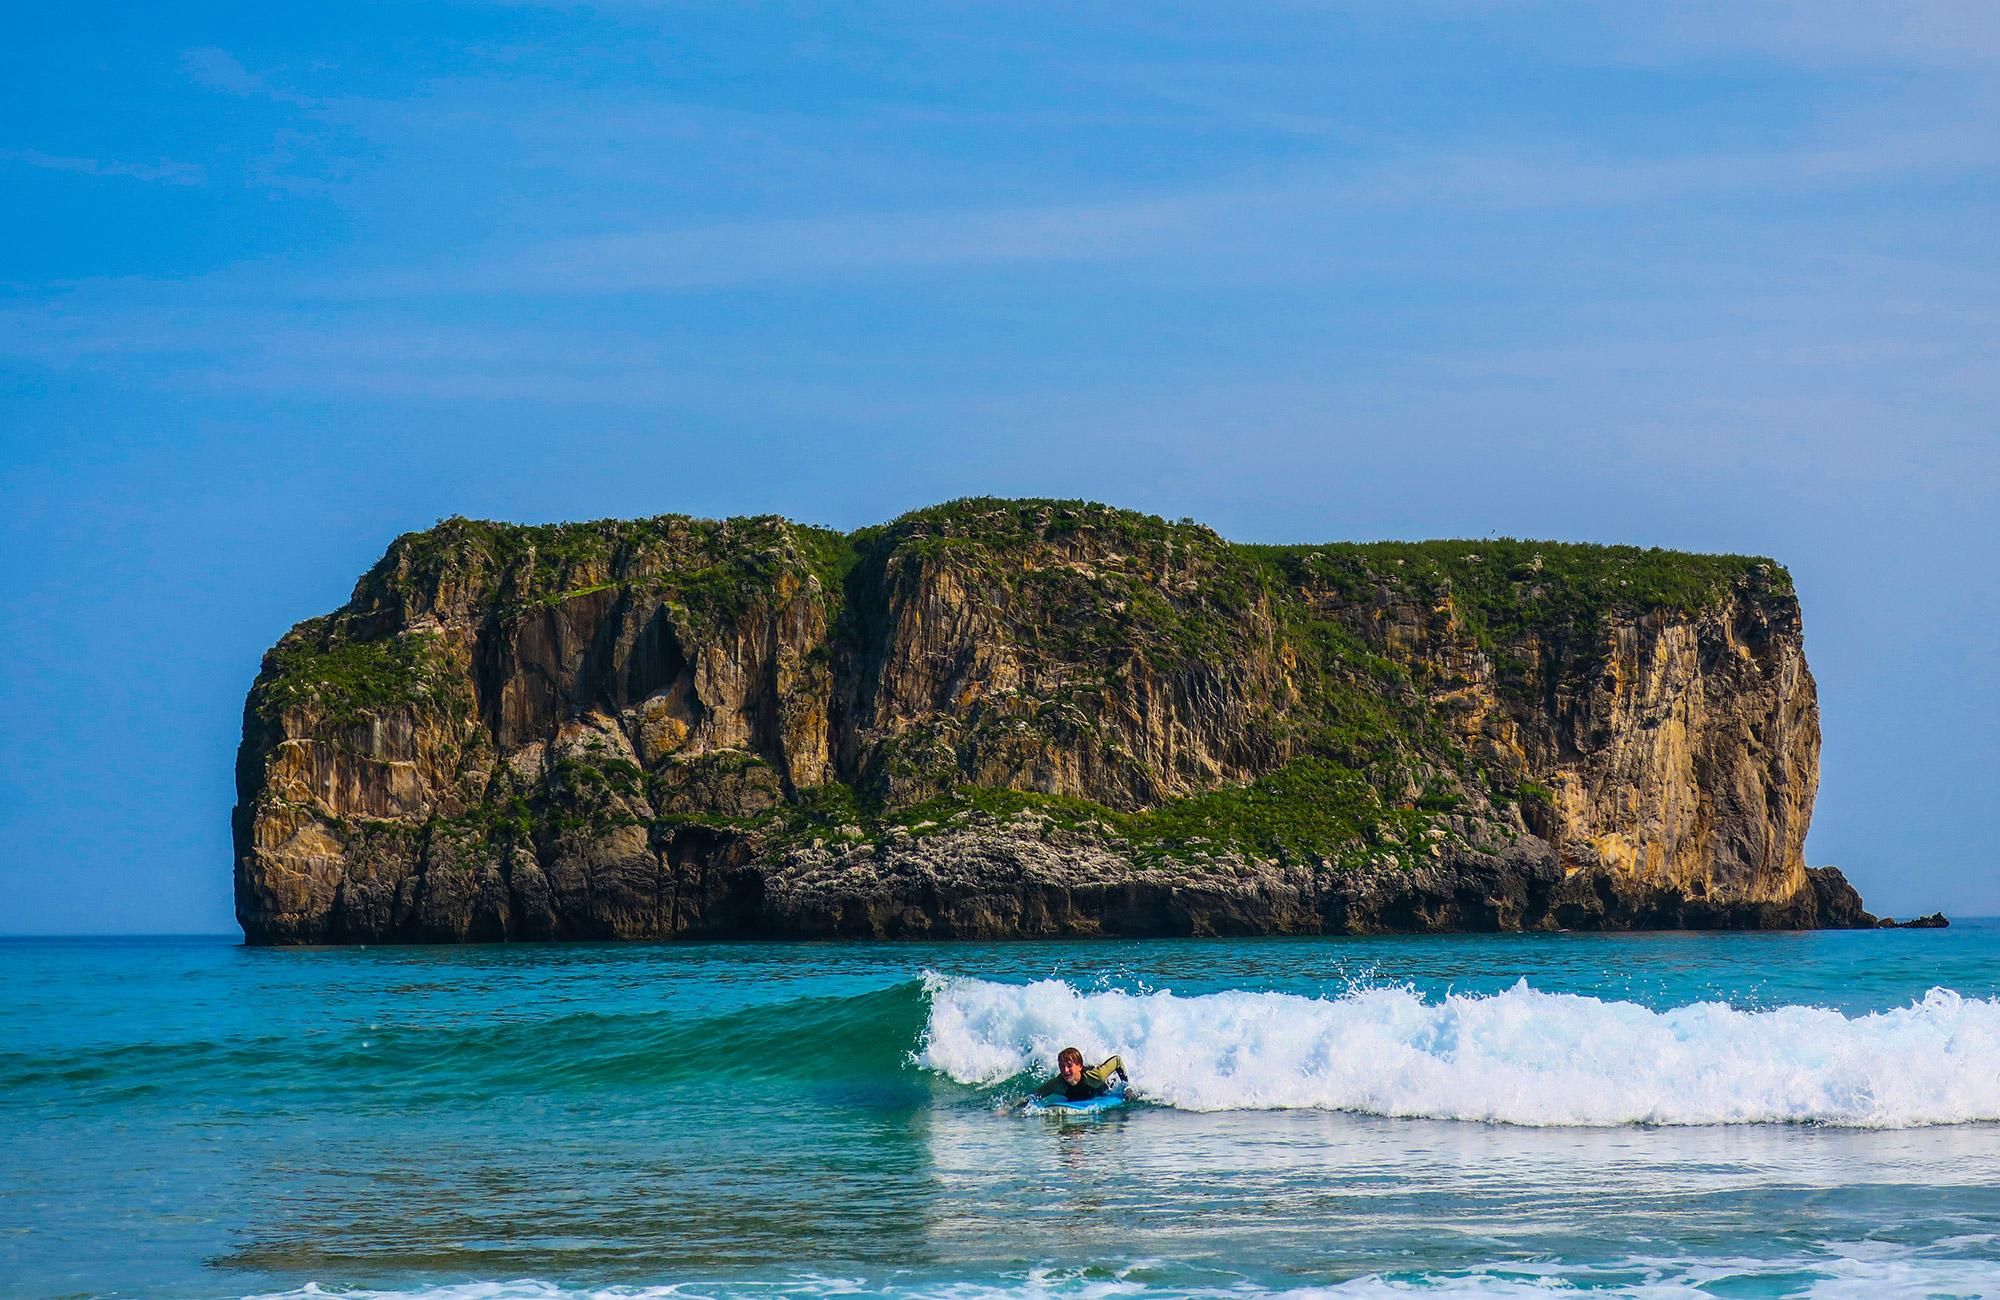 surf in llanes moondane